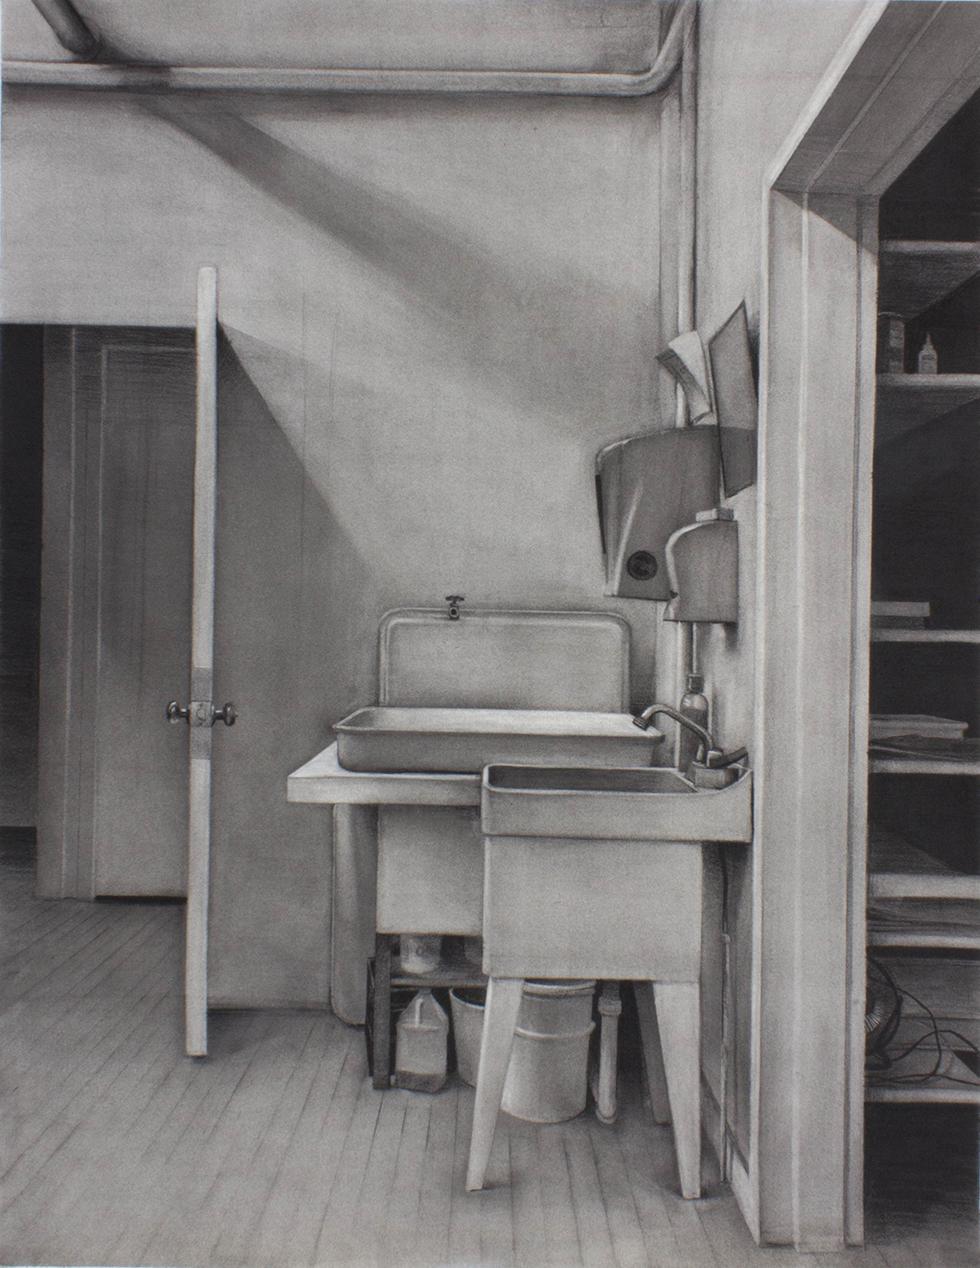 "Sean Hurley - STUDIO SINK, JOHNSON, VT - 48"" x 36"" - Charcoal"